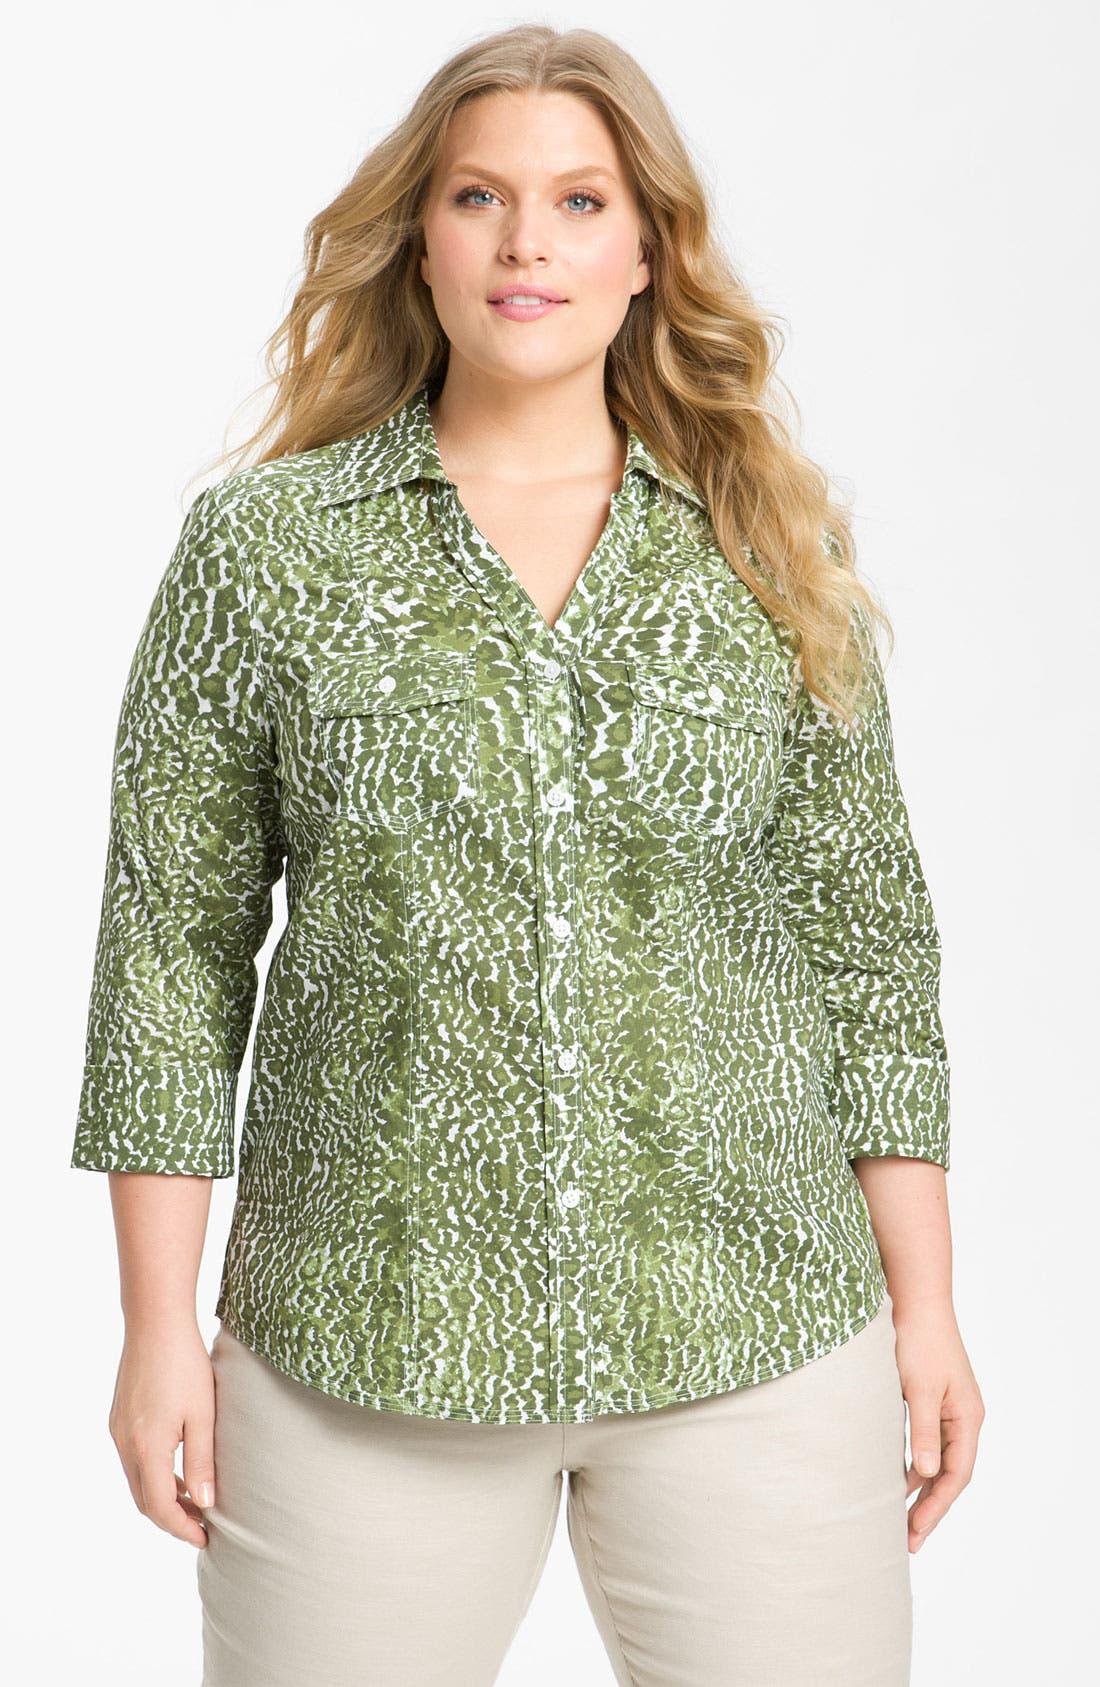 Alternate Image 1 Selected - Foxcroft Leopard Print Shaped Shirt (Plus)